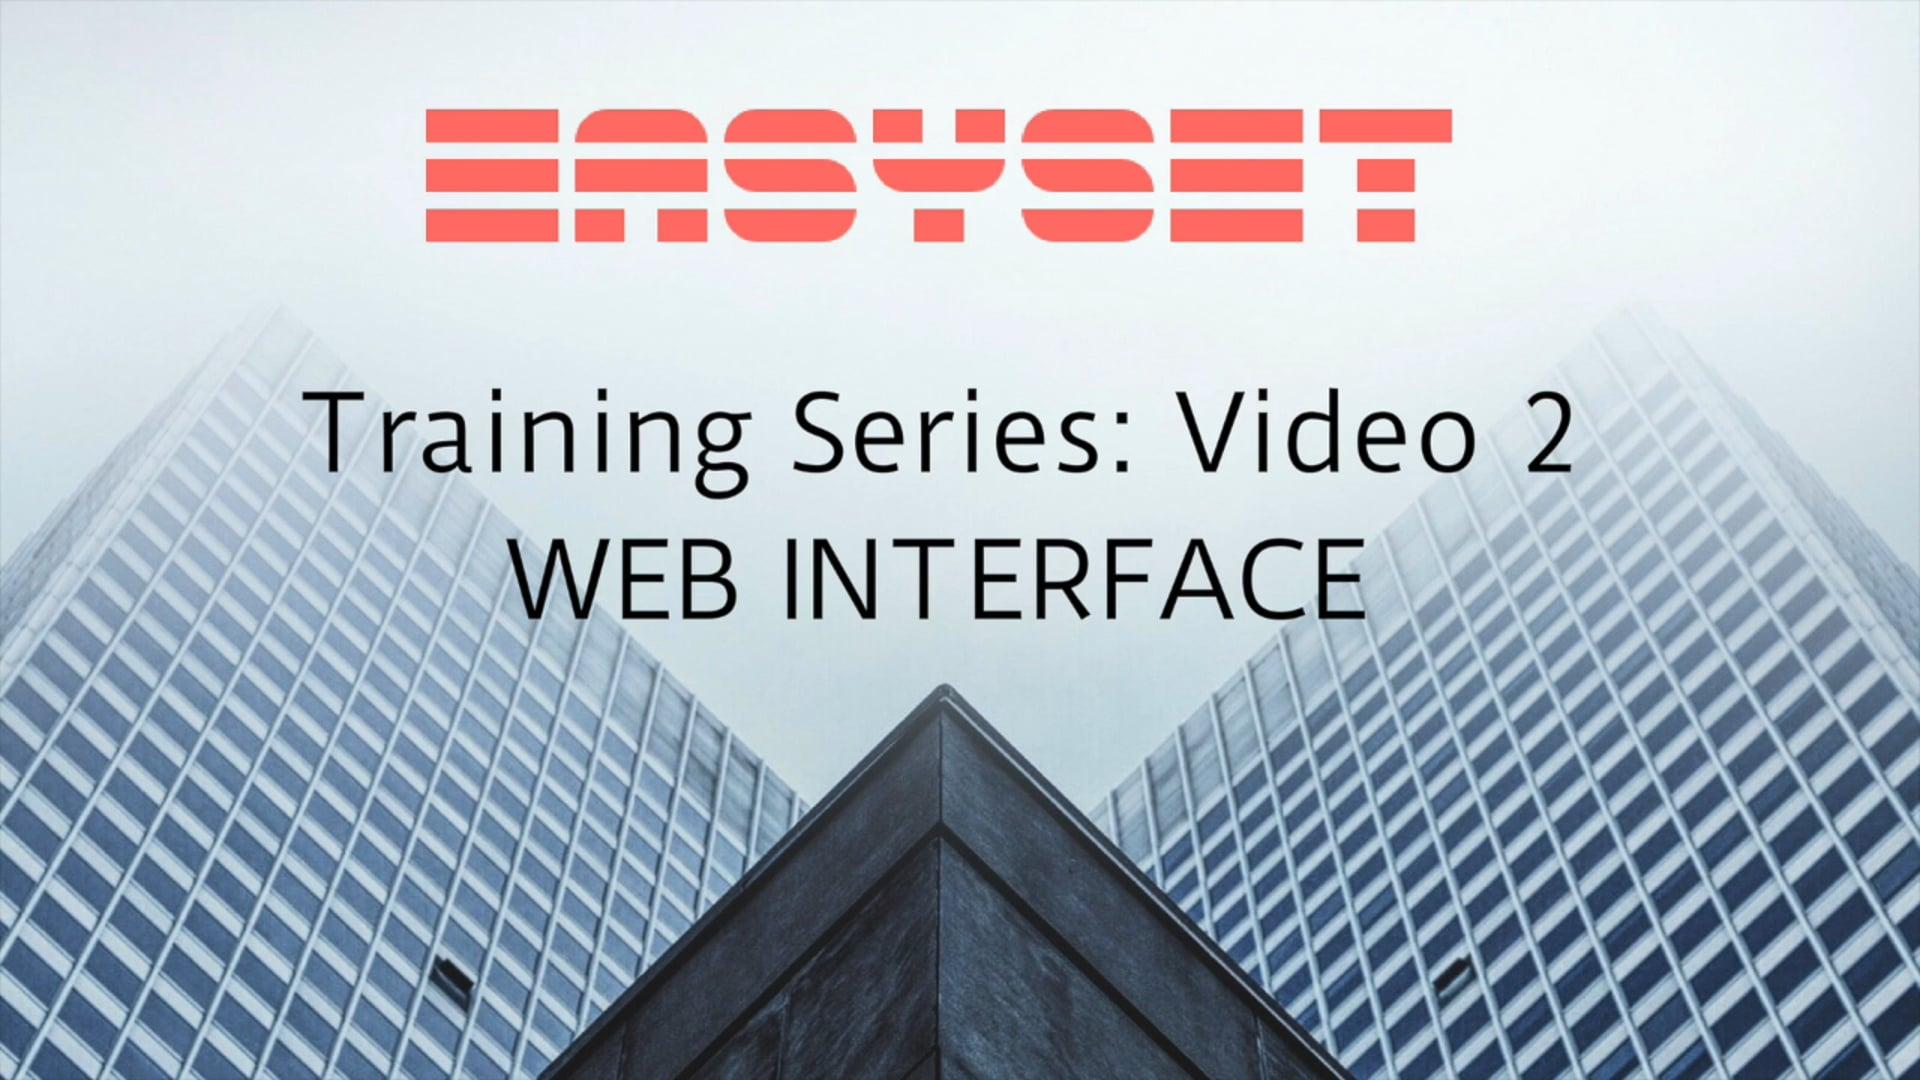 Video 2: Web Interface